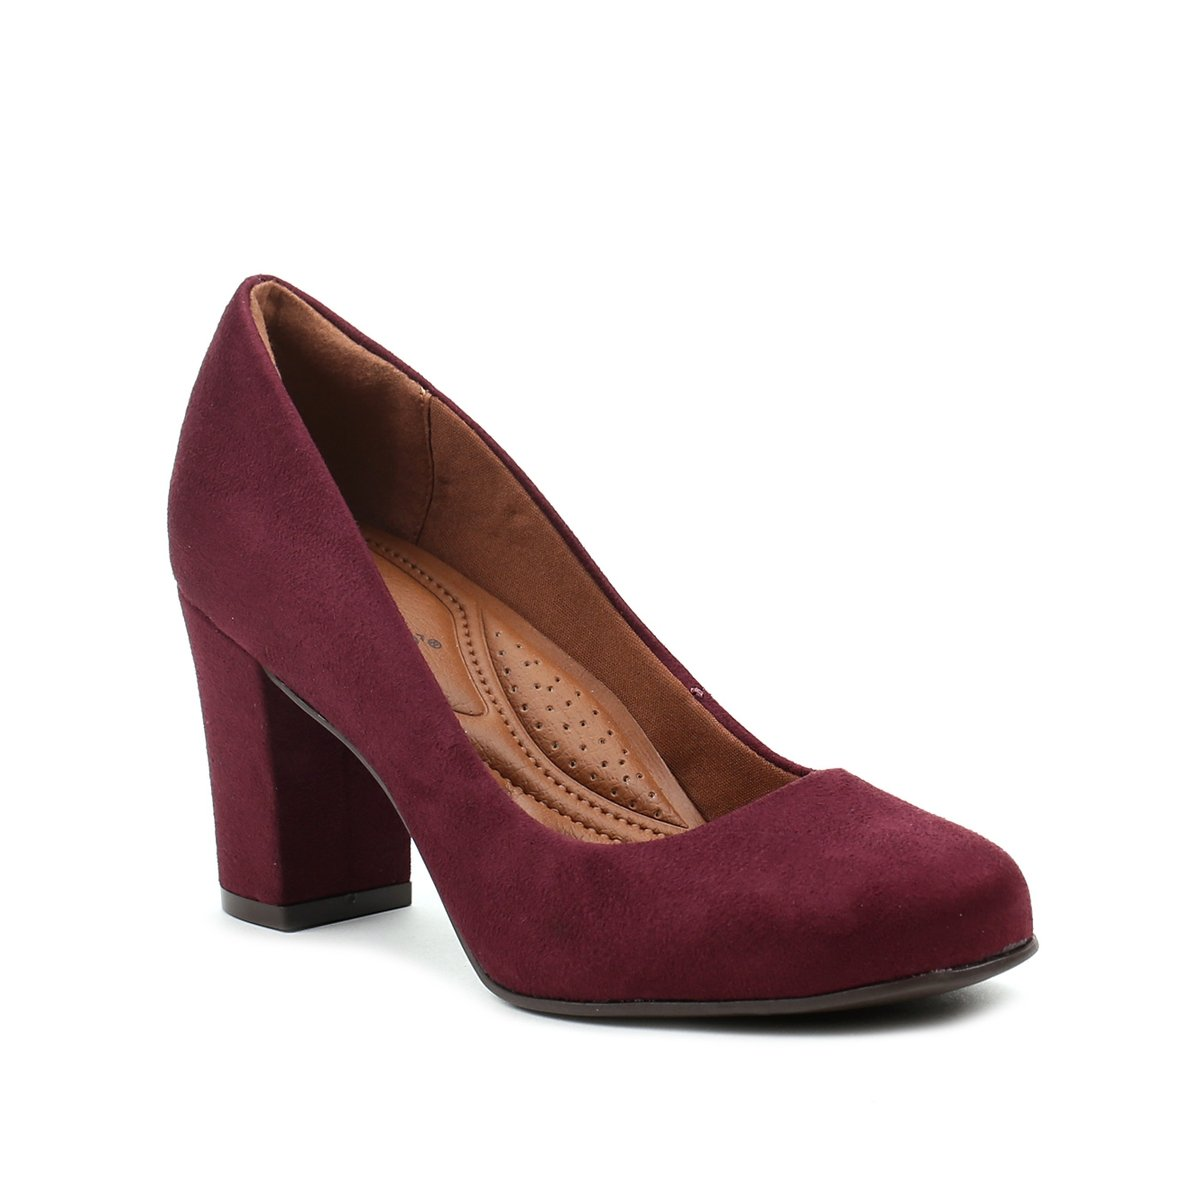 64048fbc0 Sapato de Salto Feminino Bebecê Bordô - Compre Agora